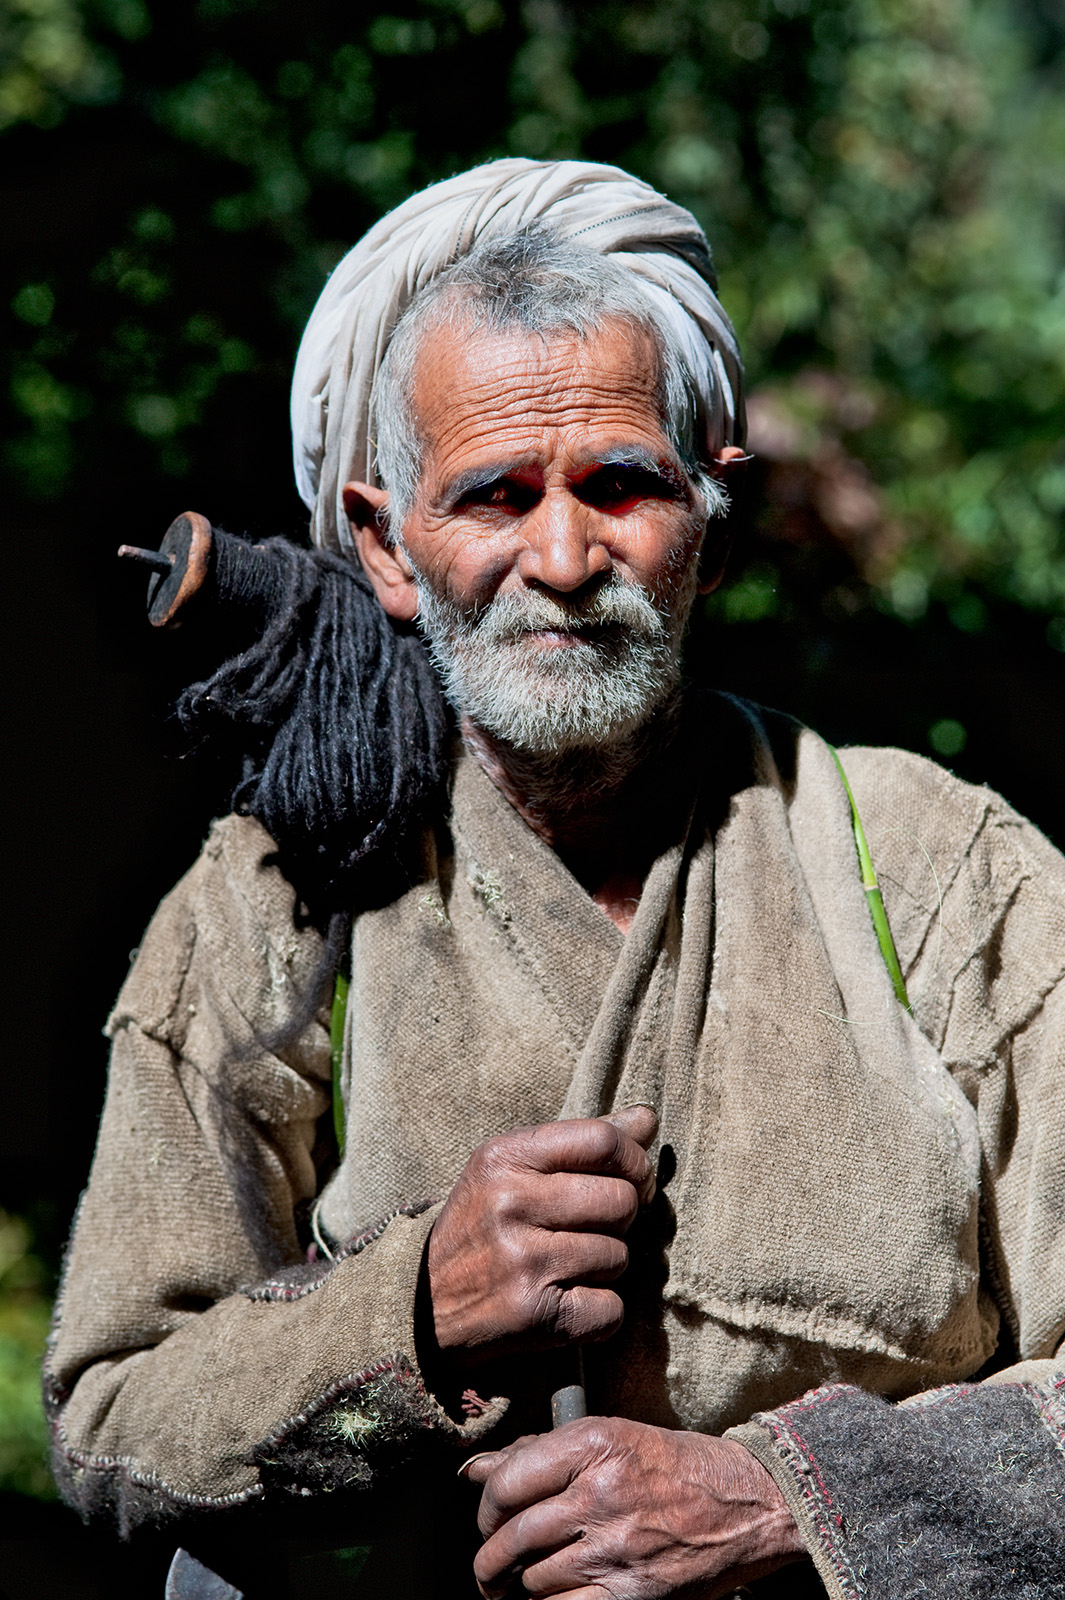 A fellow traveller on the trail to Rees, Uttarakhand, India. Trek Day 21